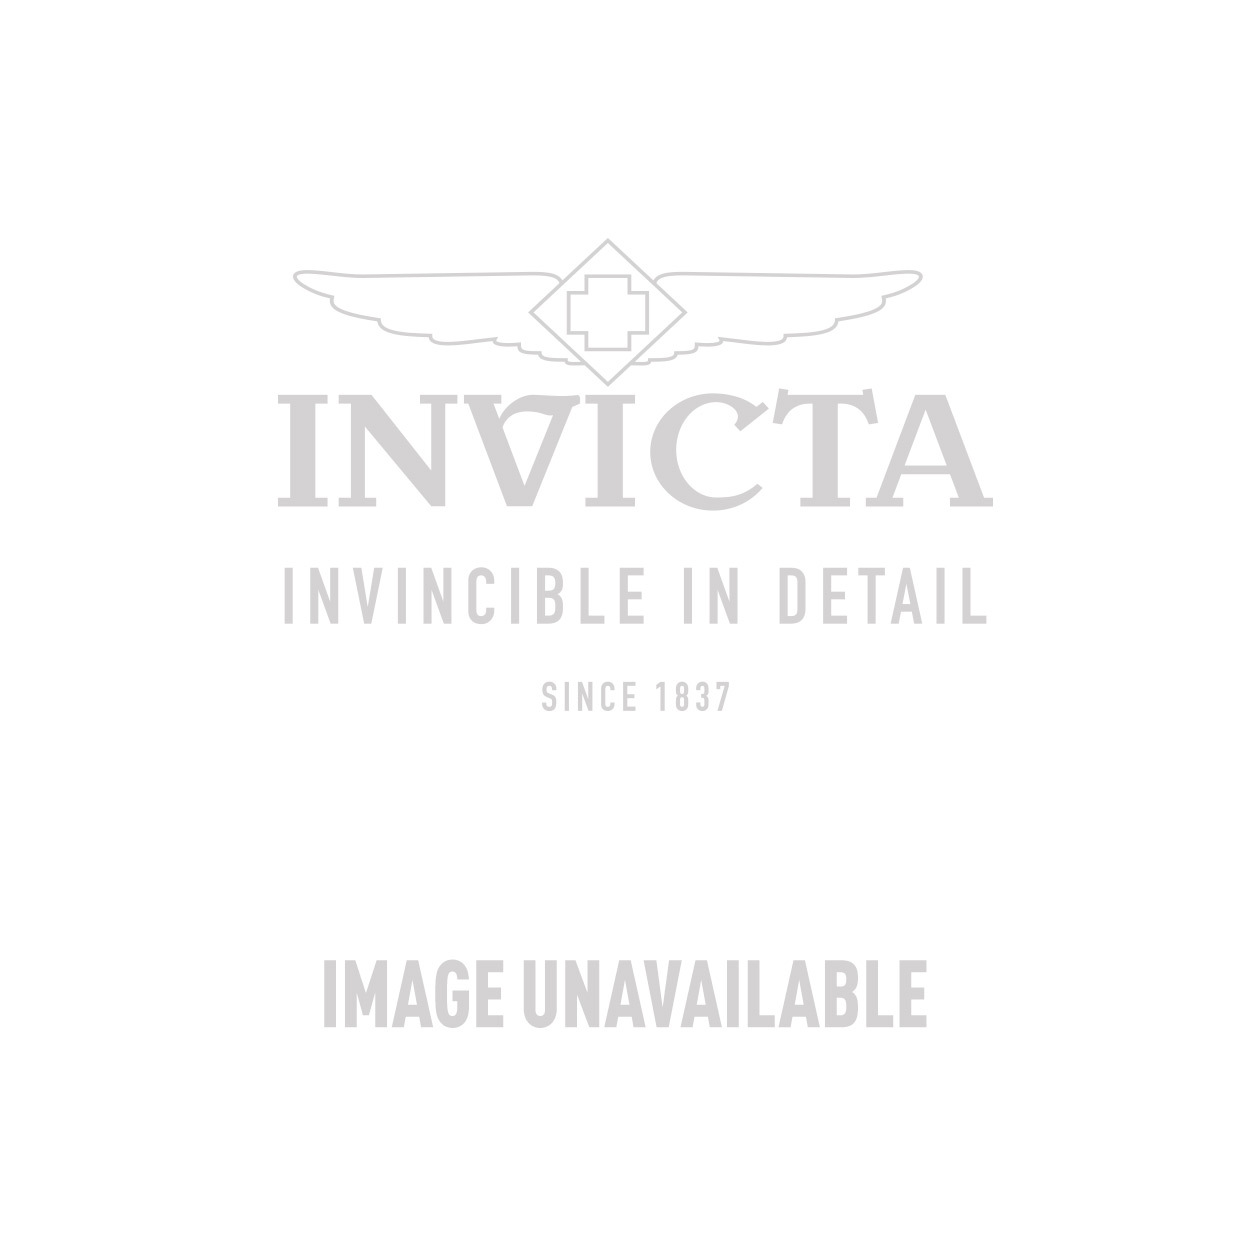 Invicta Aviator Swiss Movement Quartz Watch - Rose Gold case with Black tone Polyurethane band - Model 10684